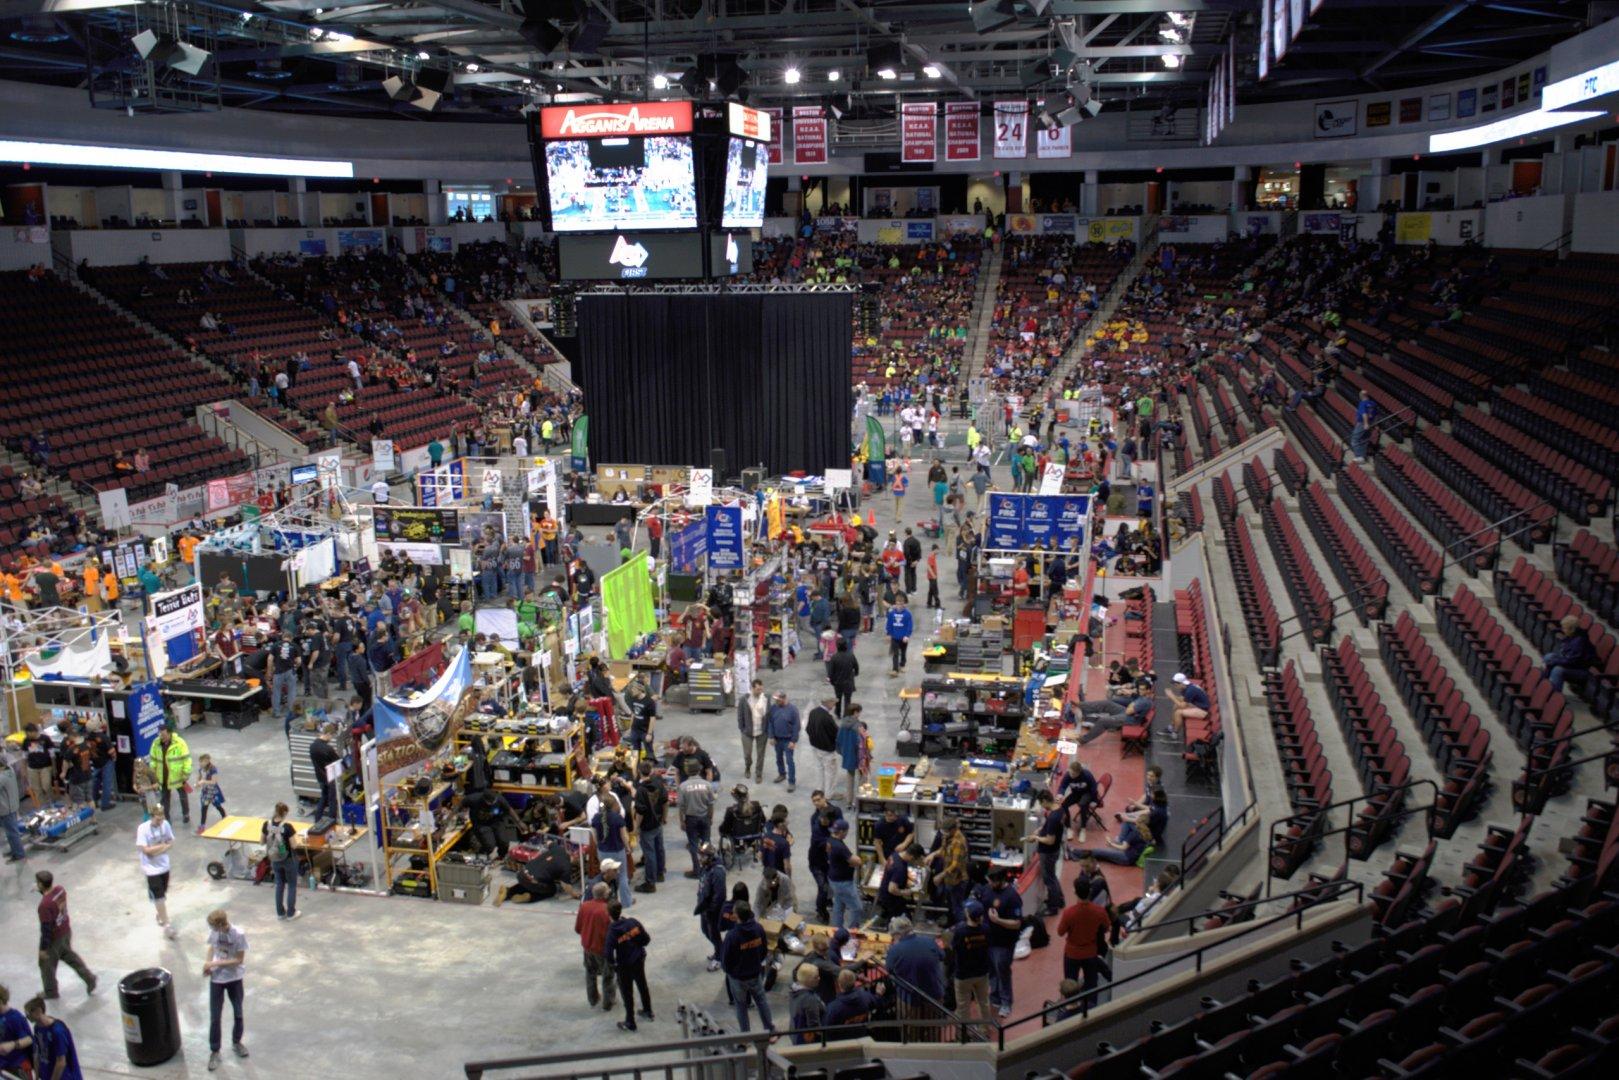 086.Boston FIRST Robotics Competition 04-03-2016.jpg